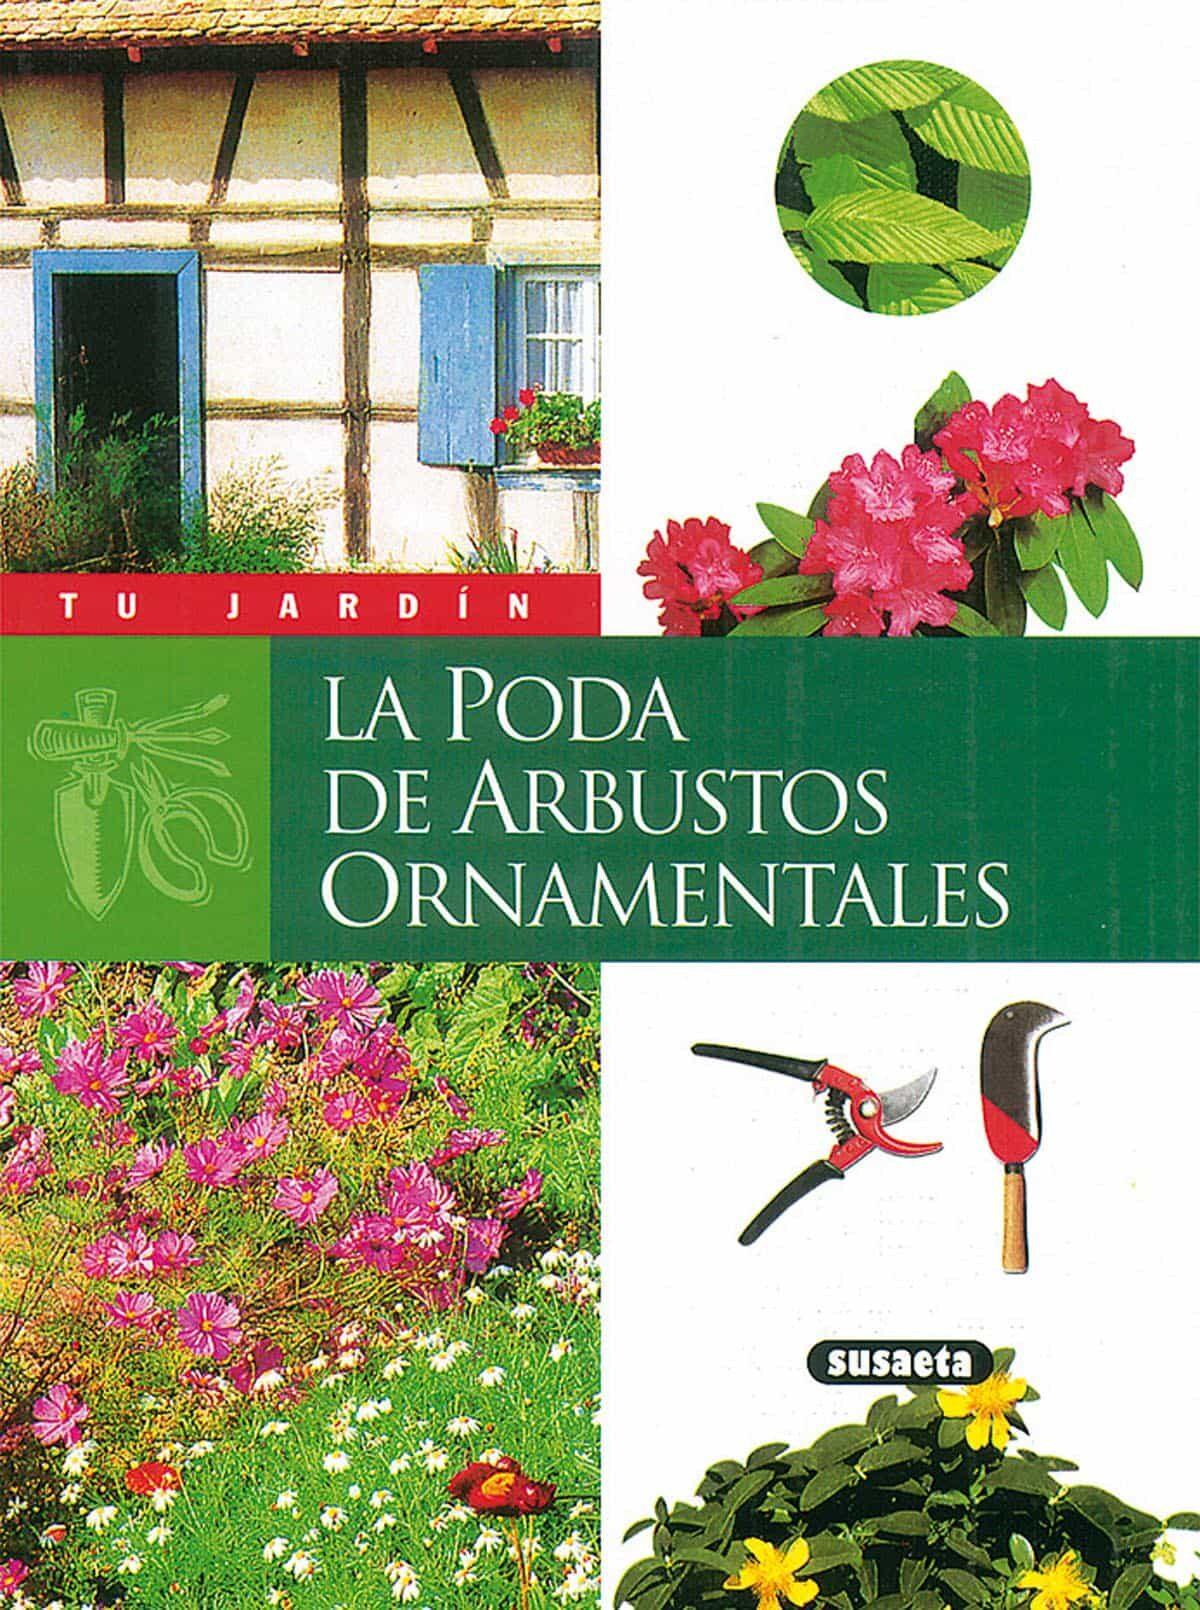 la poda de arbustos ornamentales-robert fritsch-9788430530021